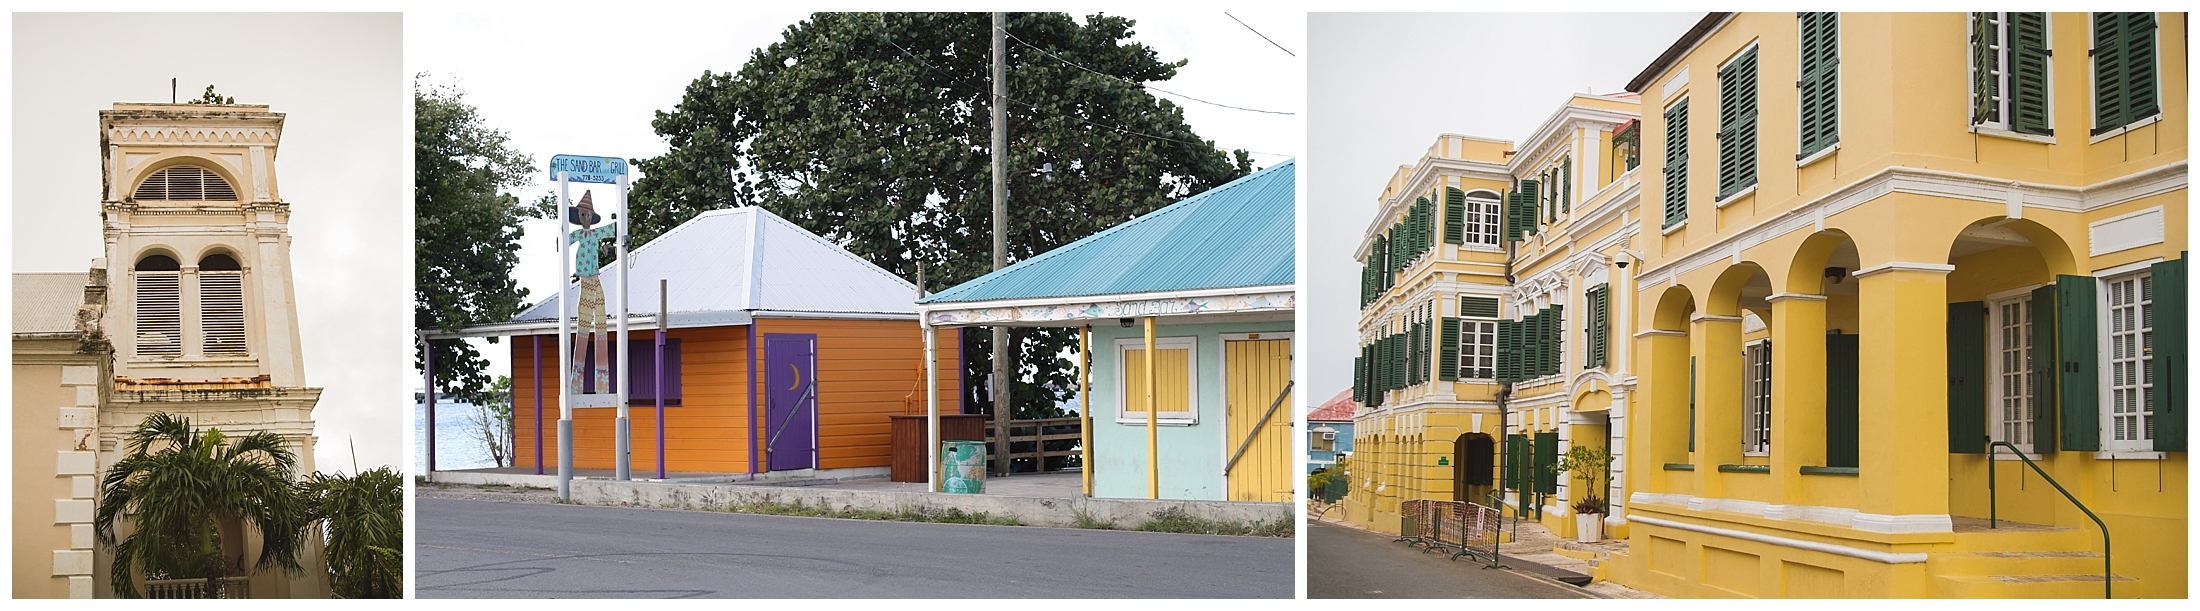 St-Croix-Trip-Itinerary-SSPTravels11.jpg